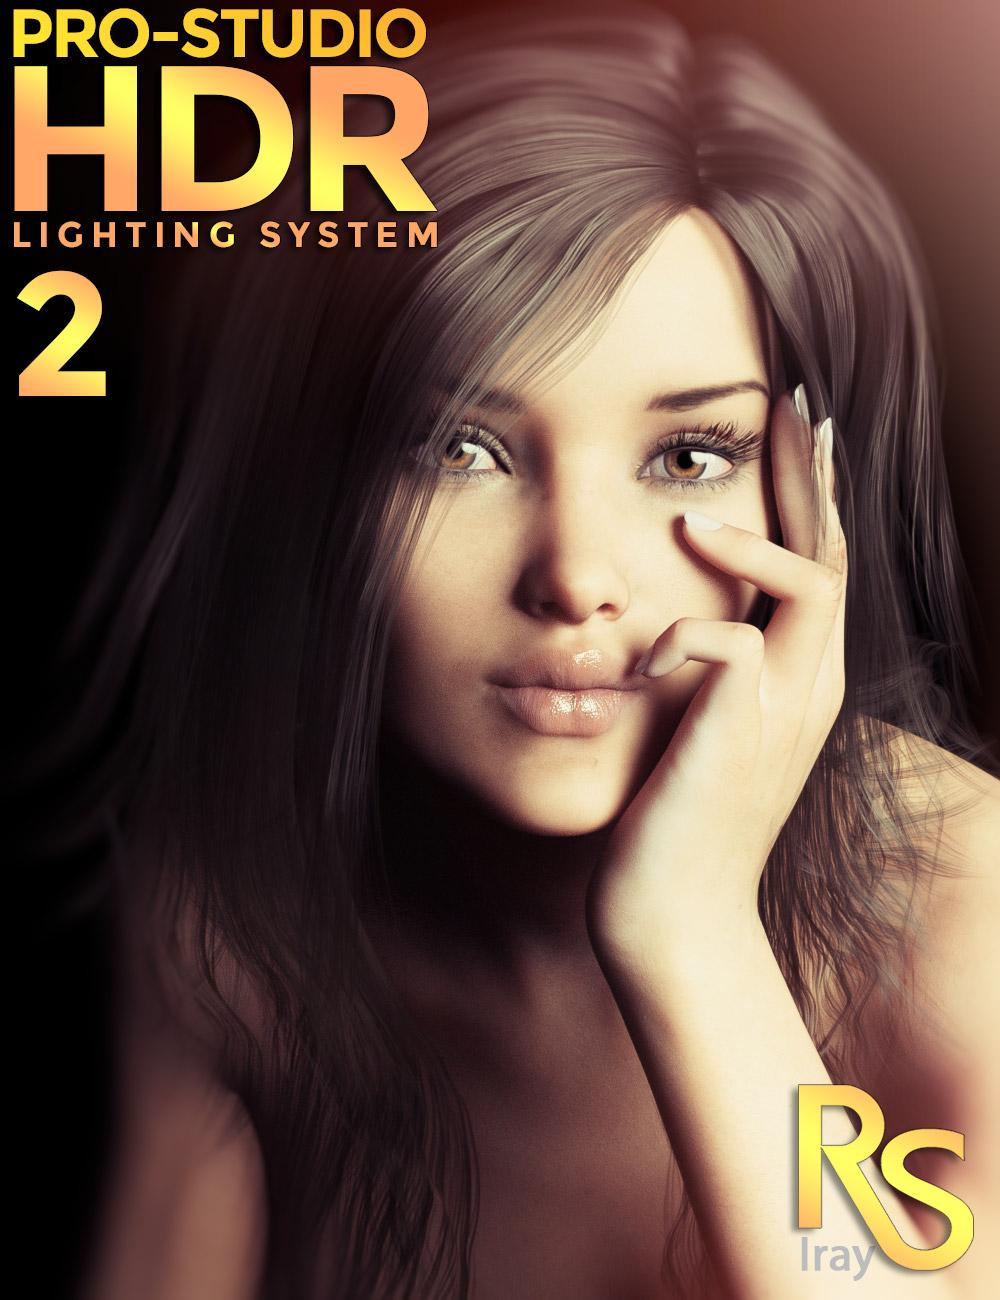 PRO-Studio HDR Lighting System 2 by: Colm Jackson, 3D Models by Daz 3D